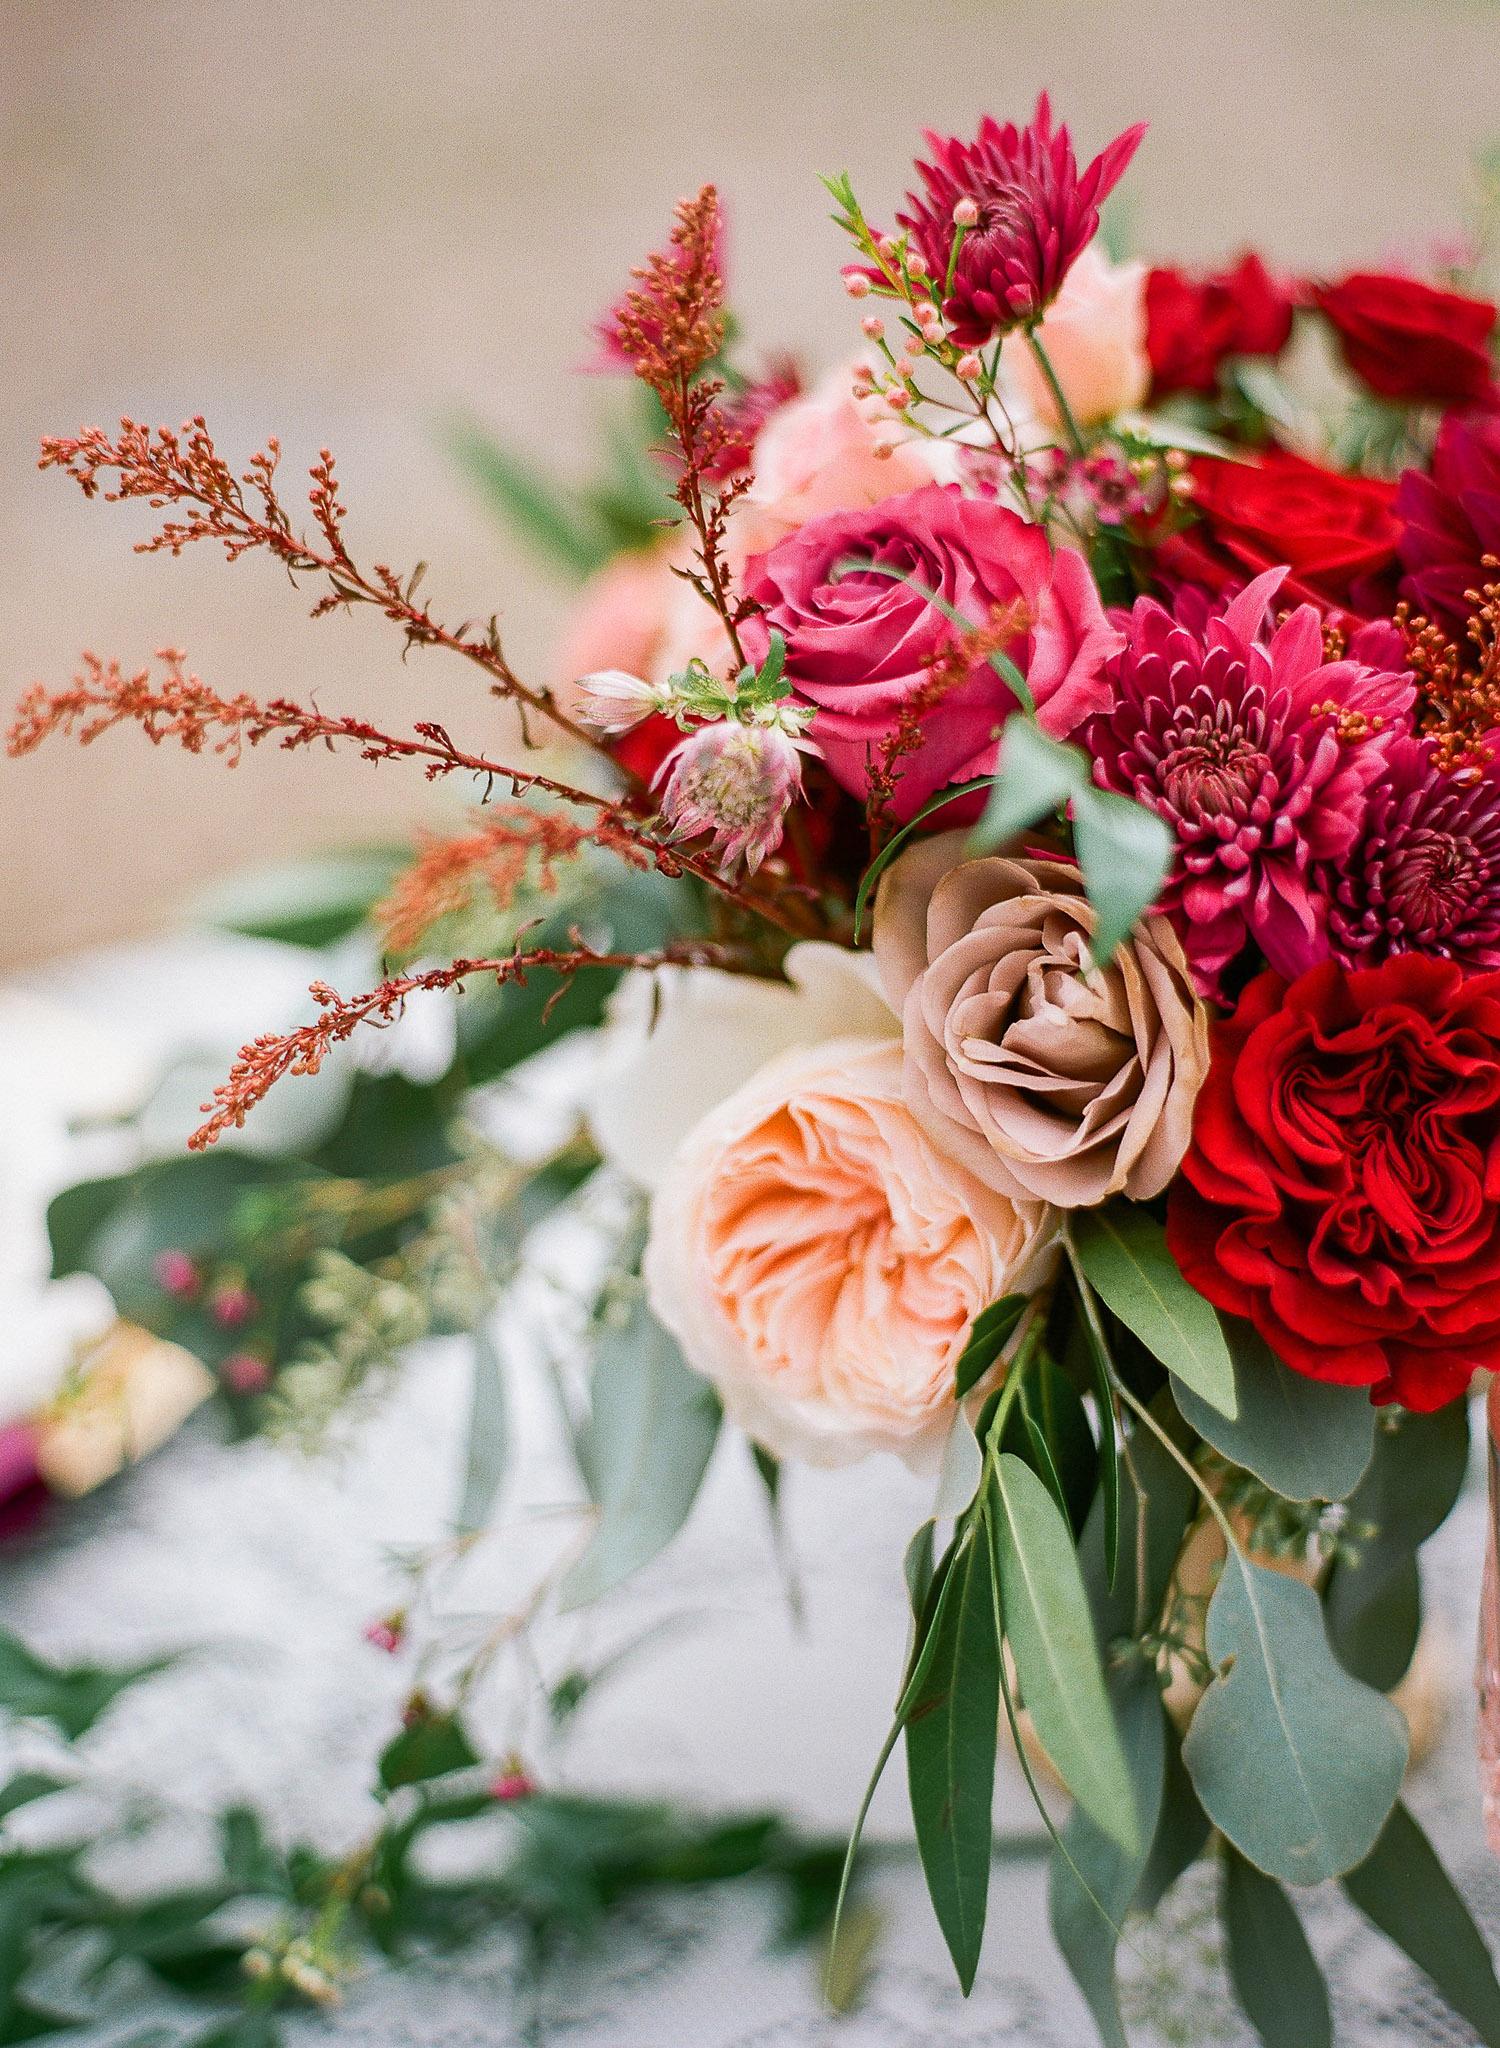 Burgundy, Mauve and Peach Florals